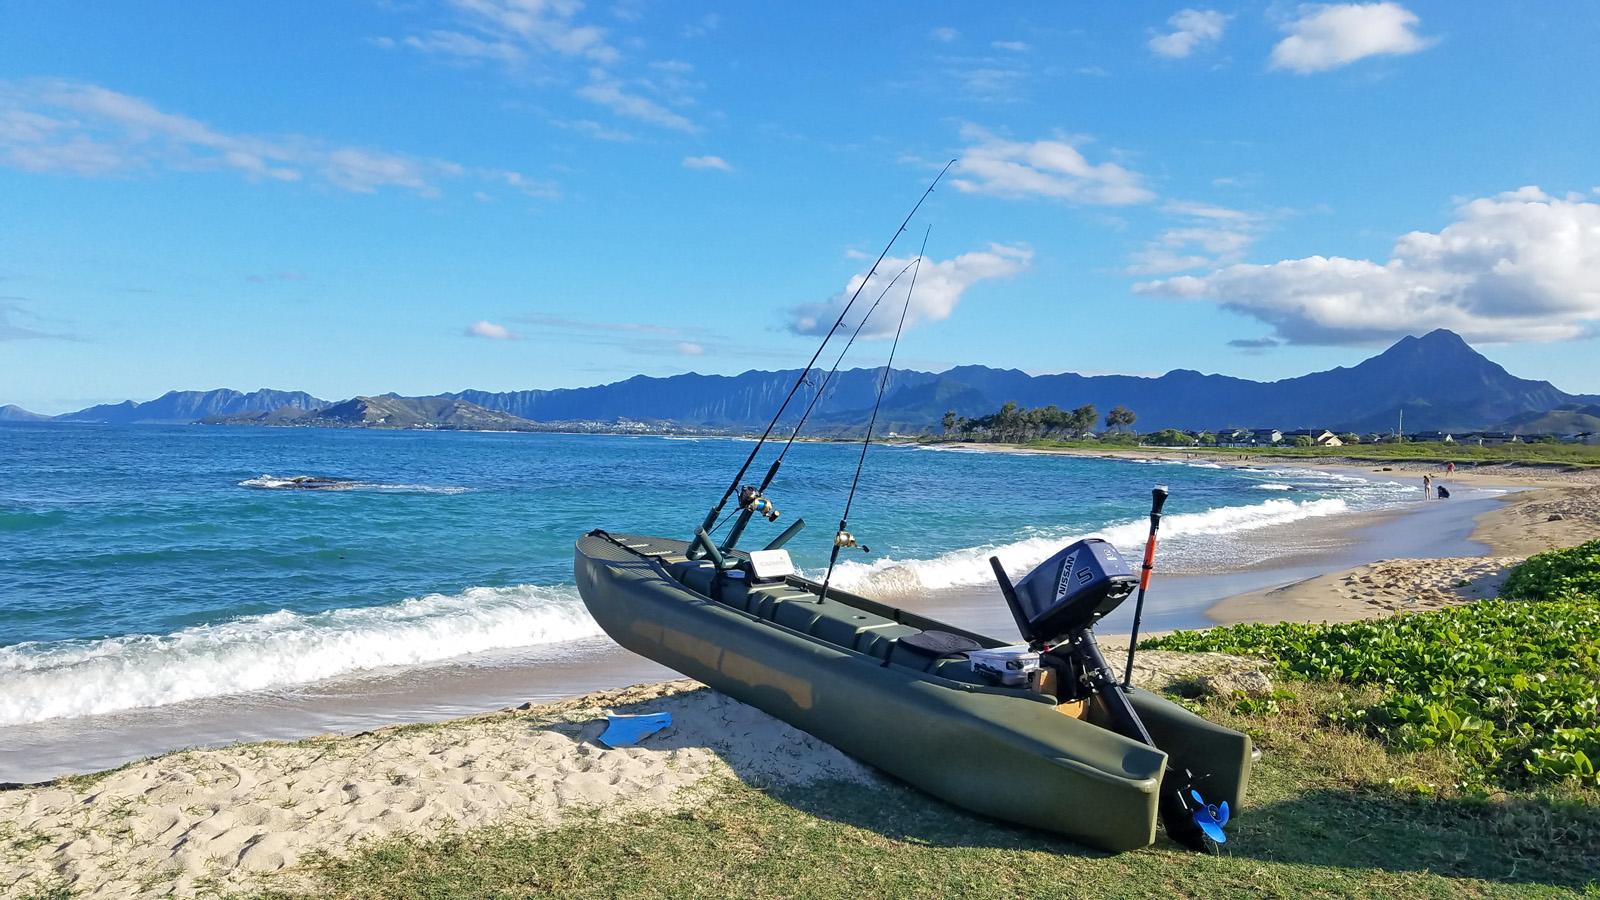 Wavewalk S4 seaworthy skiff beached in Hawaii